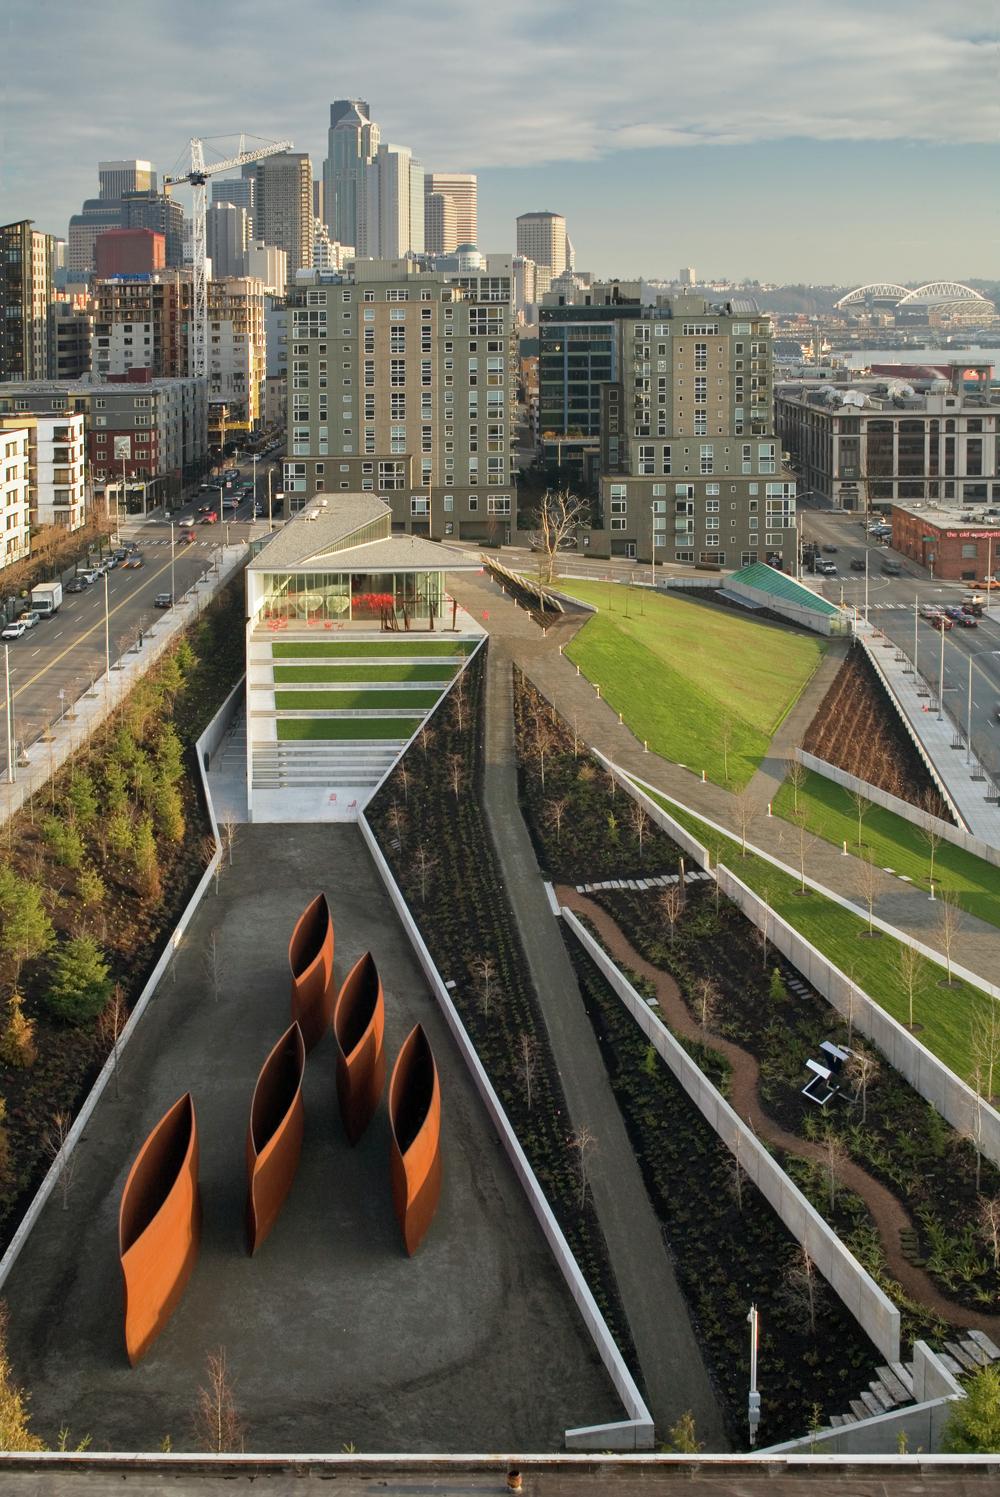 Olympic Sculpture Park Weiss Manfredi - 4